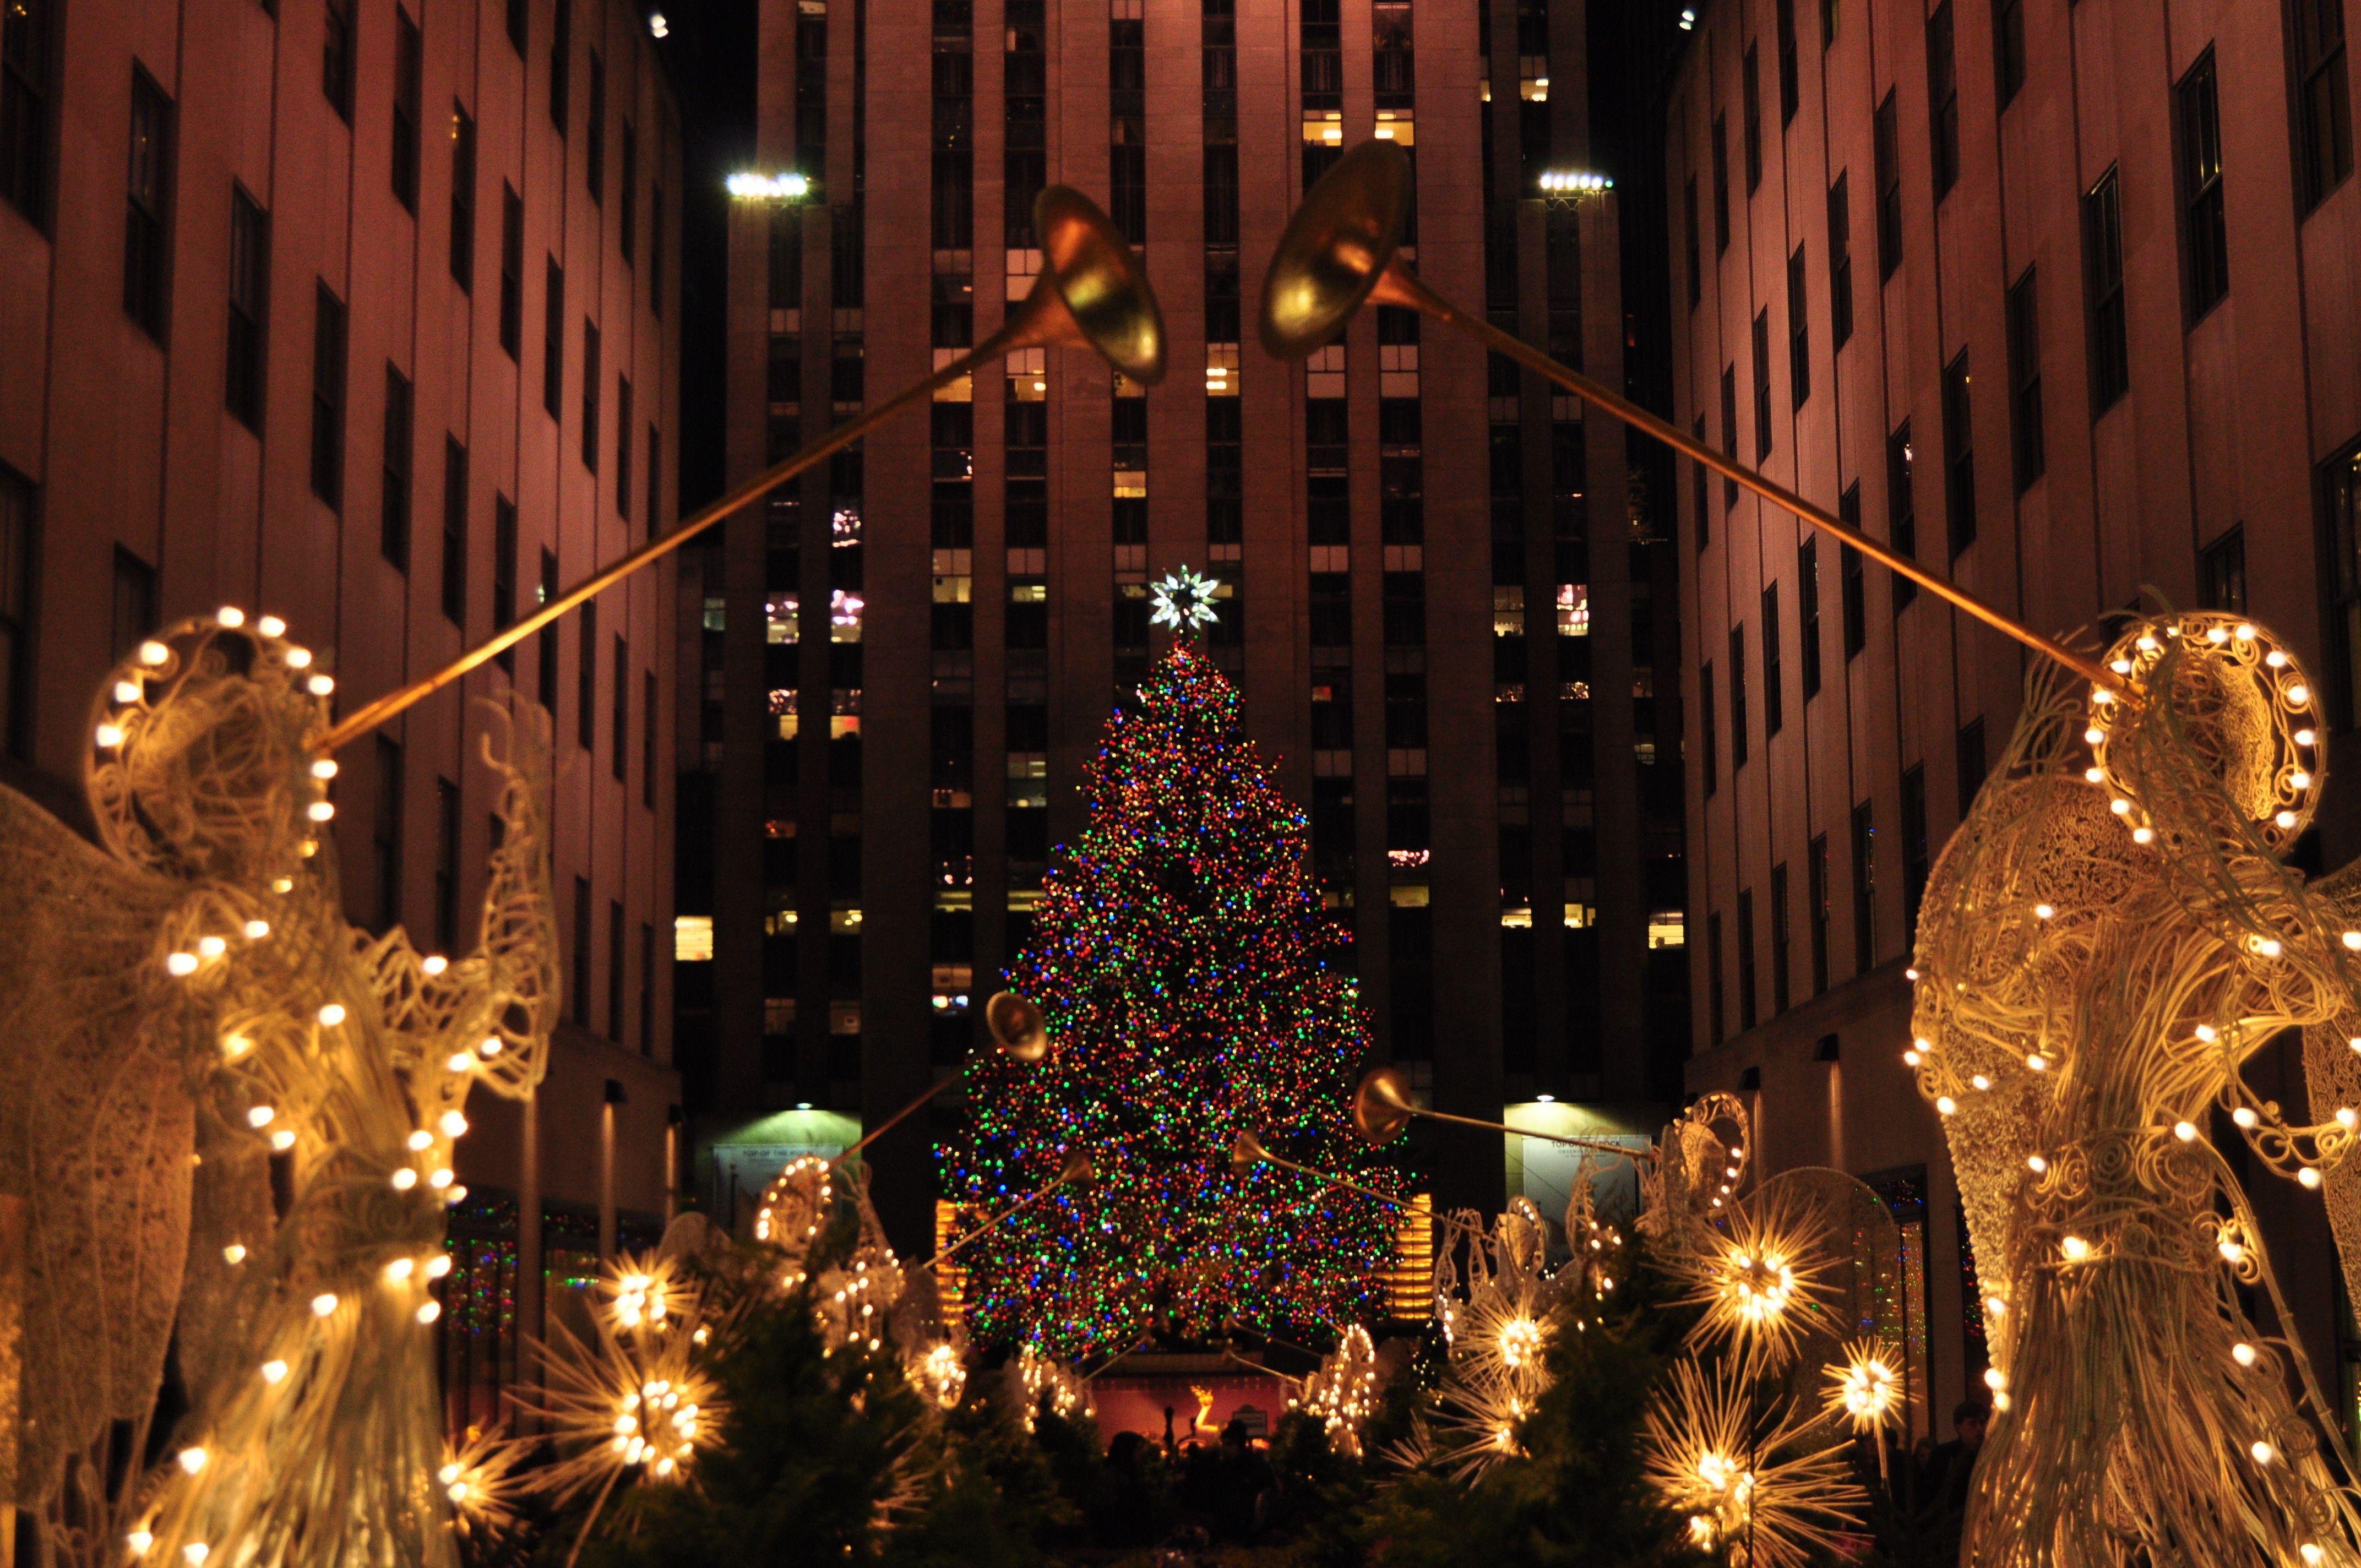 30 New York City Christmas Wallpapers Download At Wallpaperbro